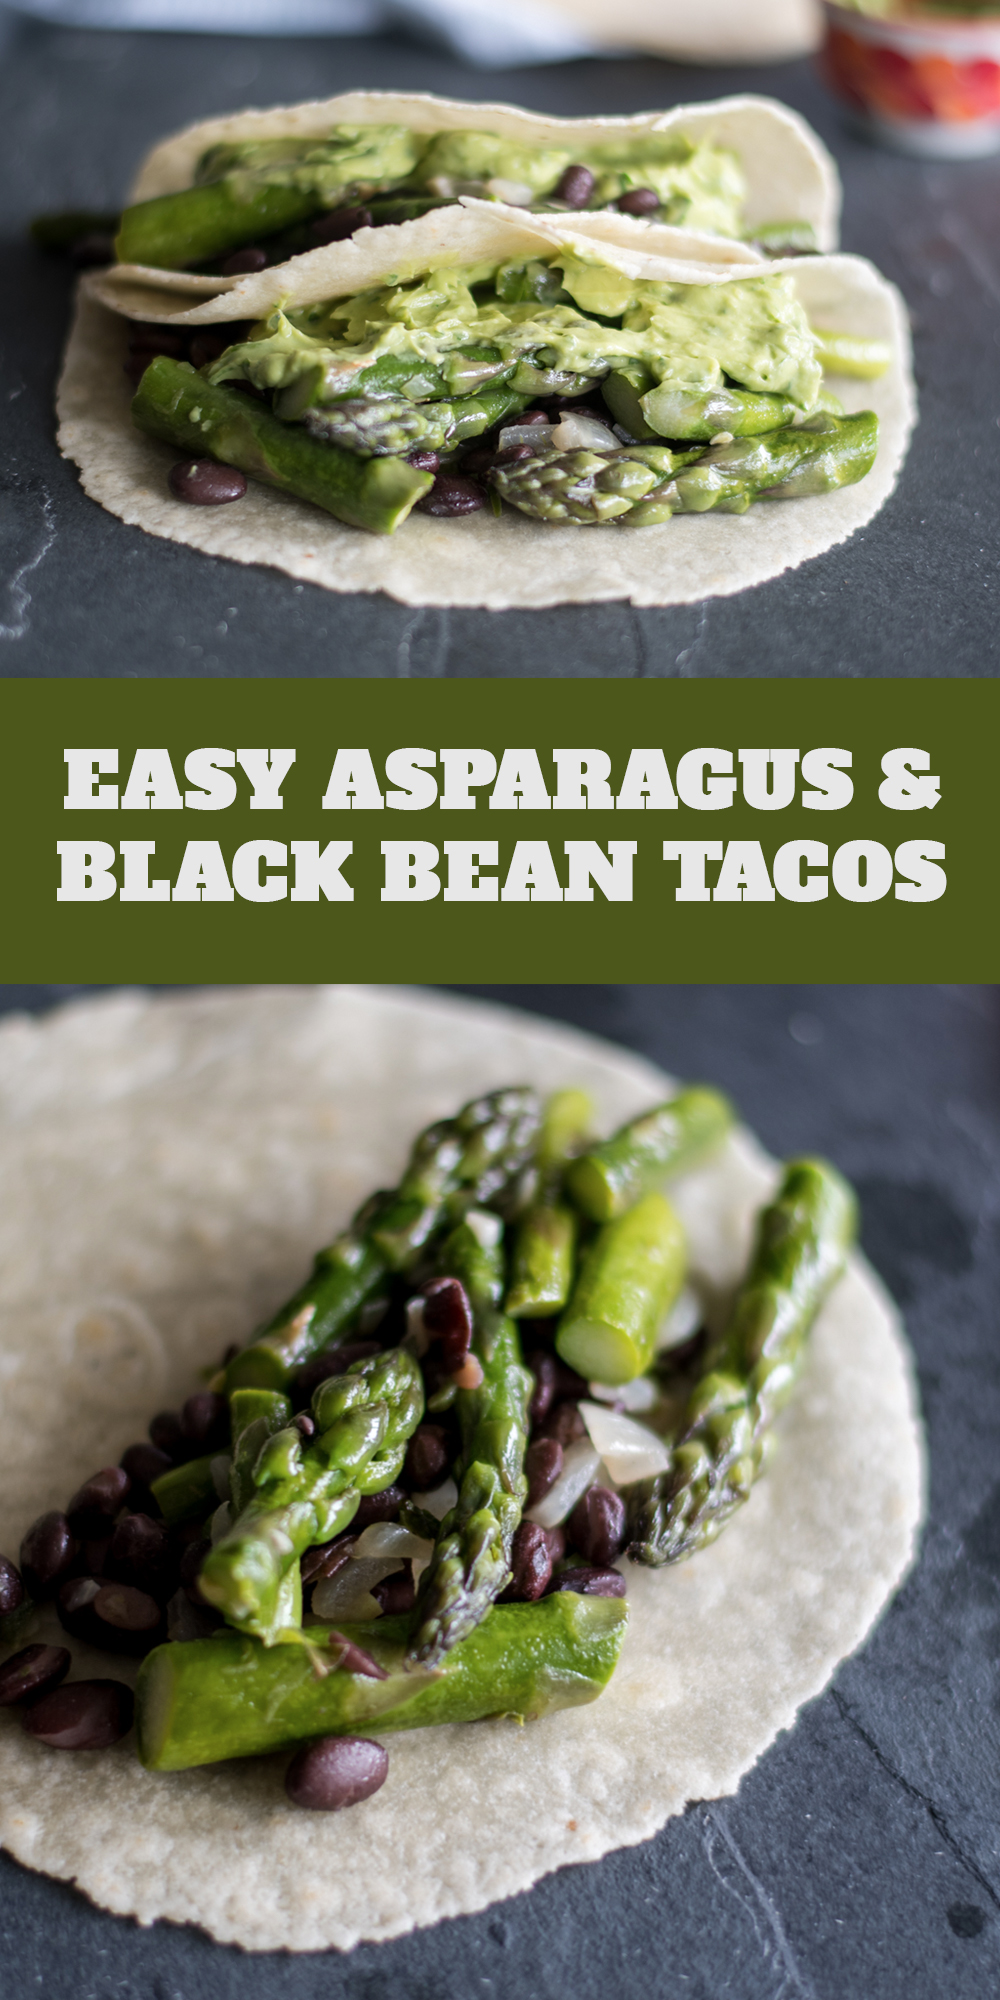 Easy Asparagus and Black Bean Tacos are the perfect taco for spring!#vegan #tacos #Mexican #asparagus #spring #dinner #easy #avocado #beans #blackbean #entree #glutenfree